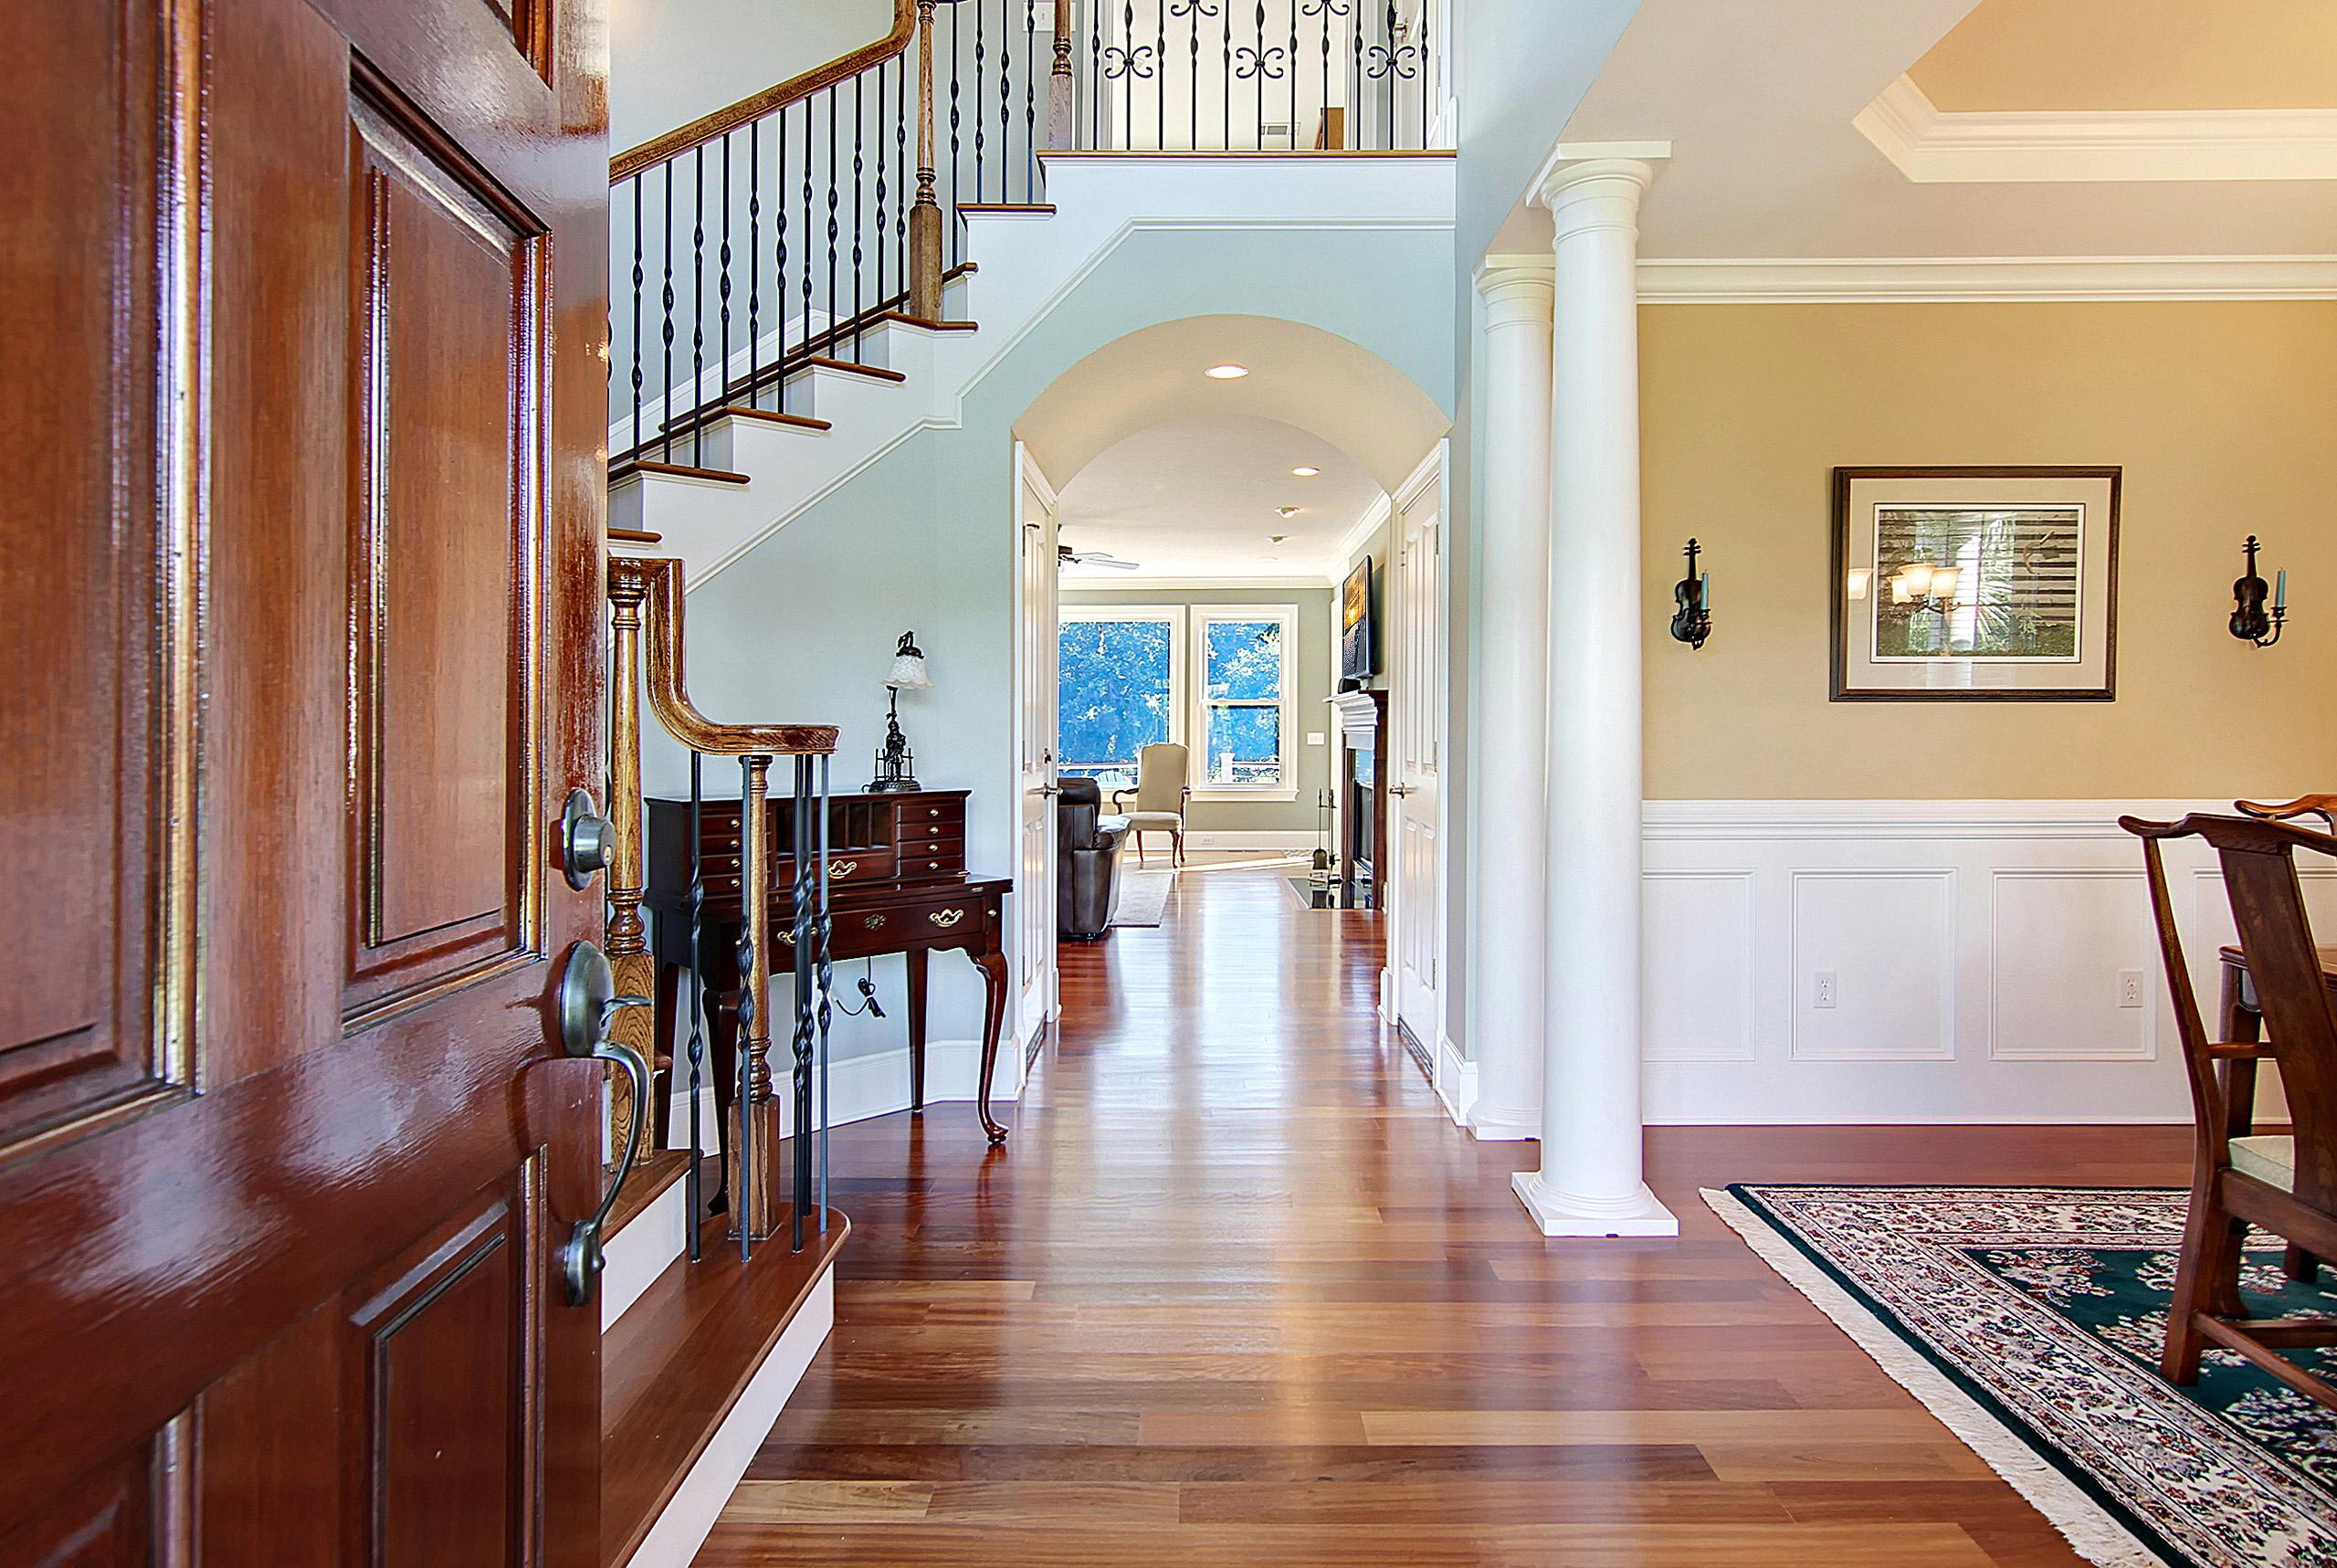 Archfield Plantation Homes For Sale - 4655 Archfield, Meggett, SC - 59